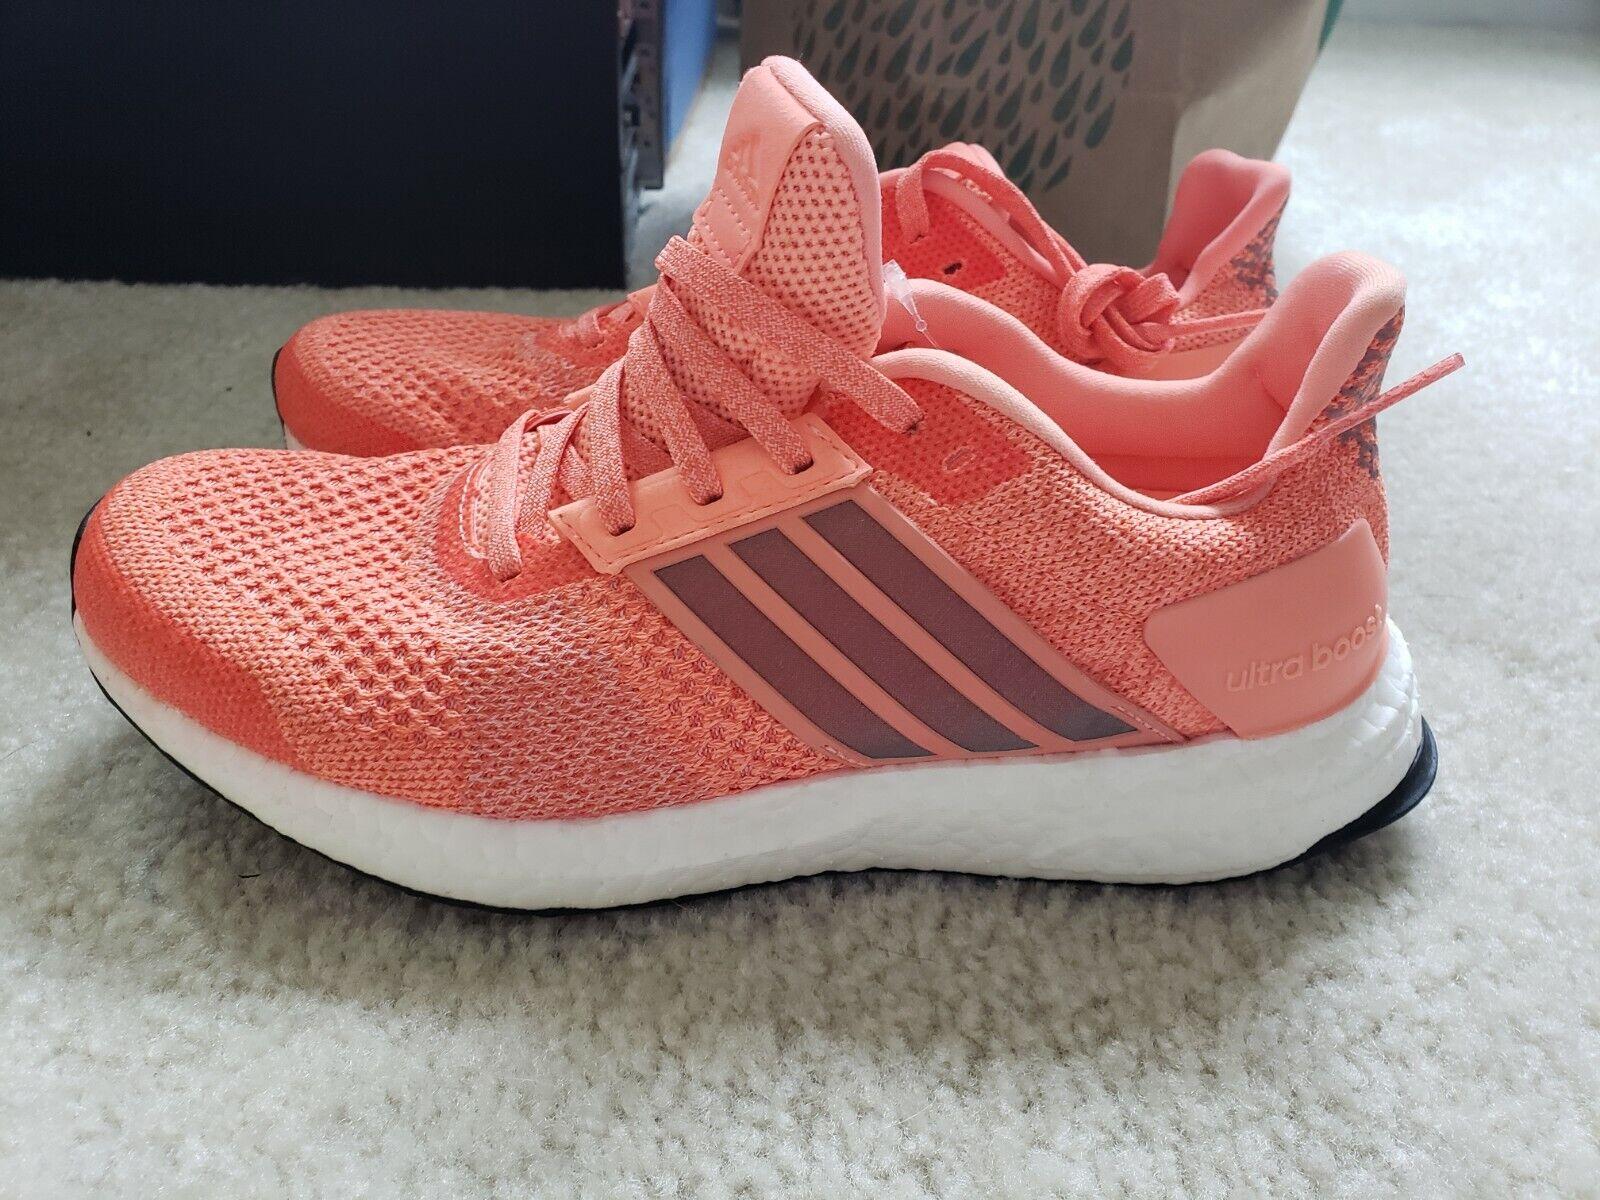 Adidas-Mujer Running-Ultra Boost St-Nuevo-Us 7-Naranja